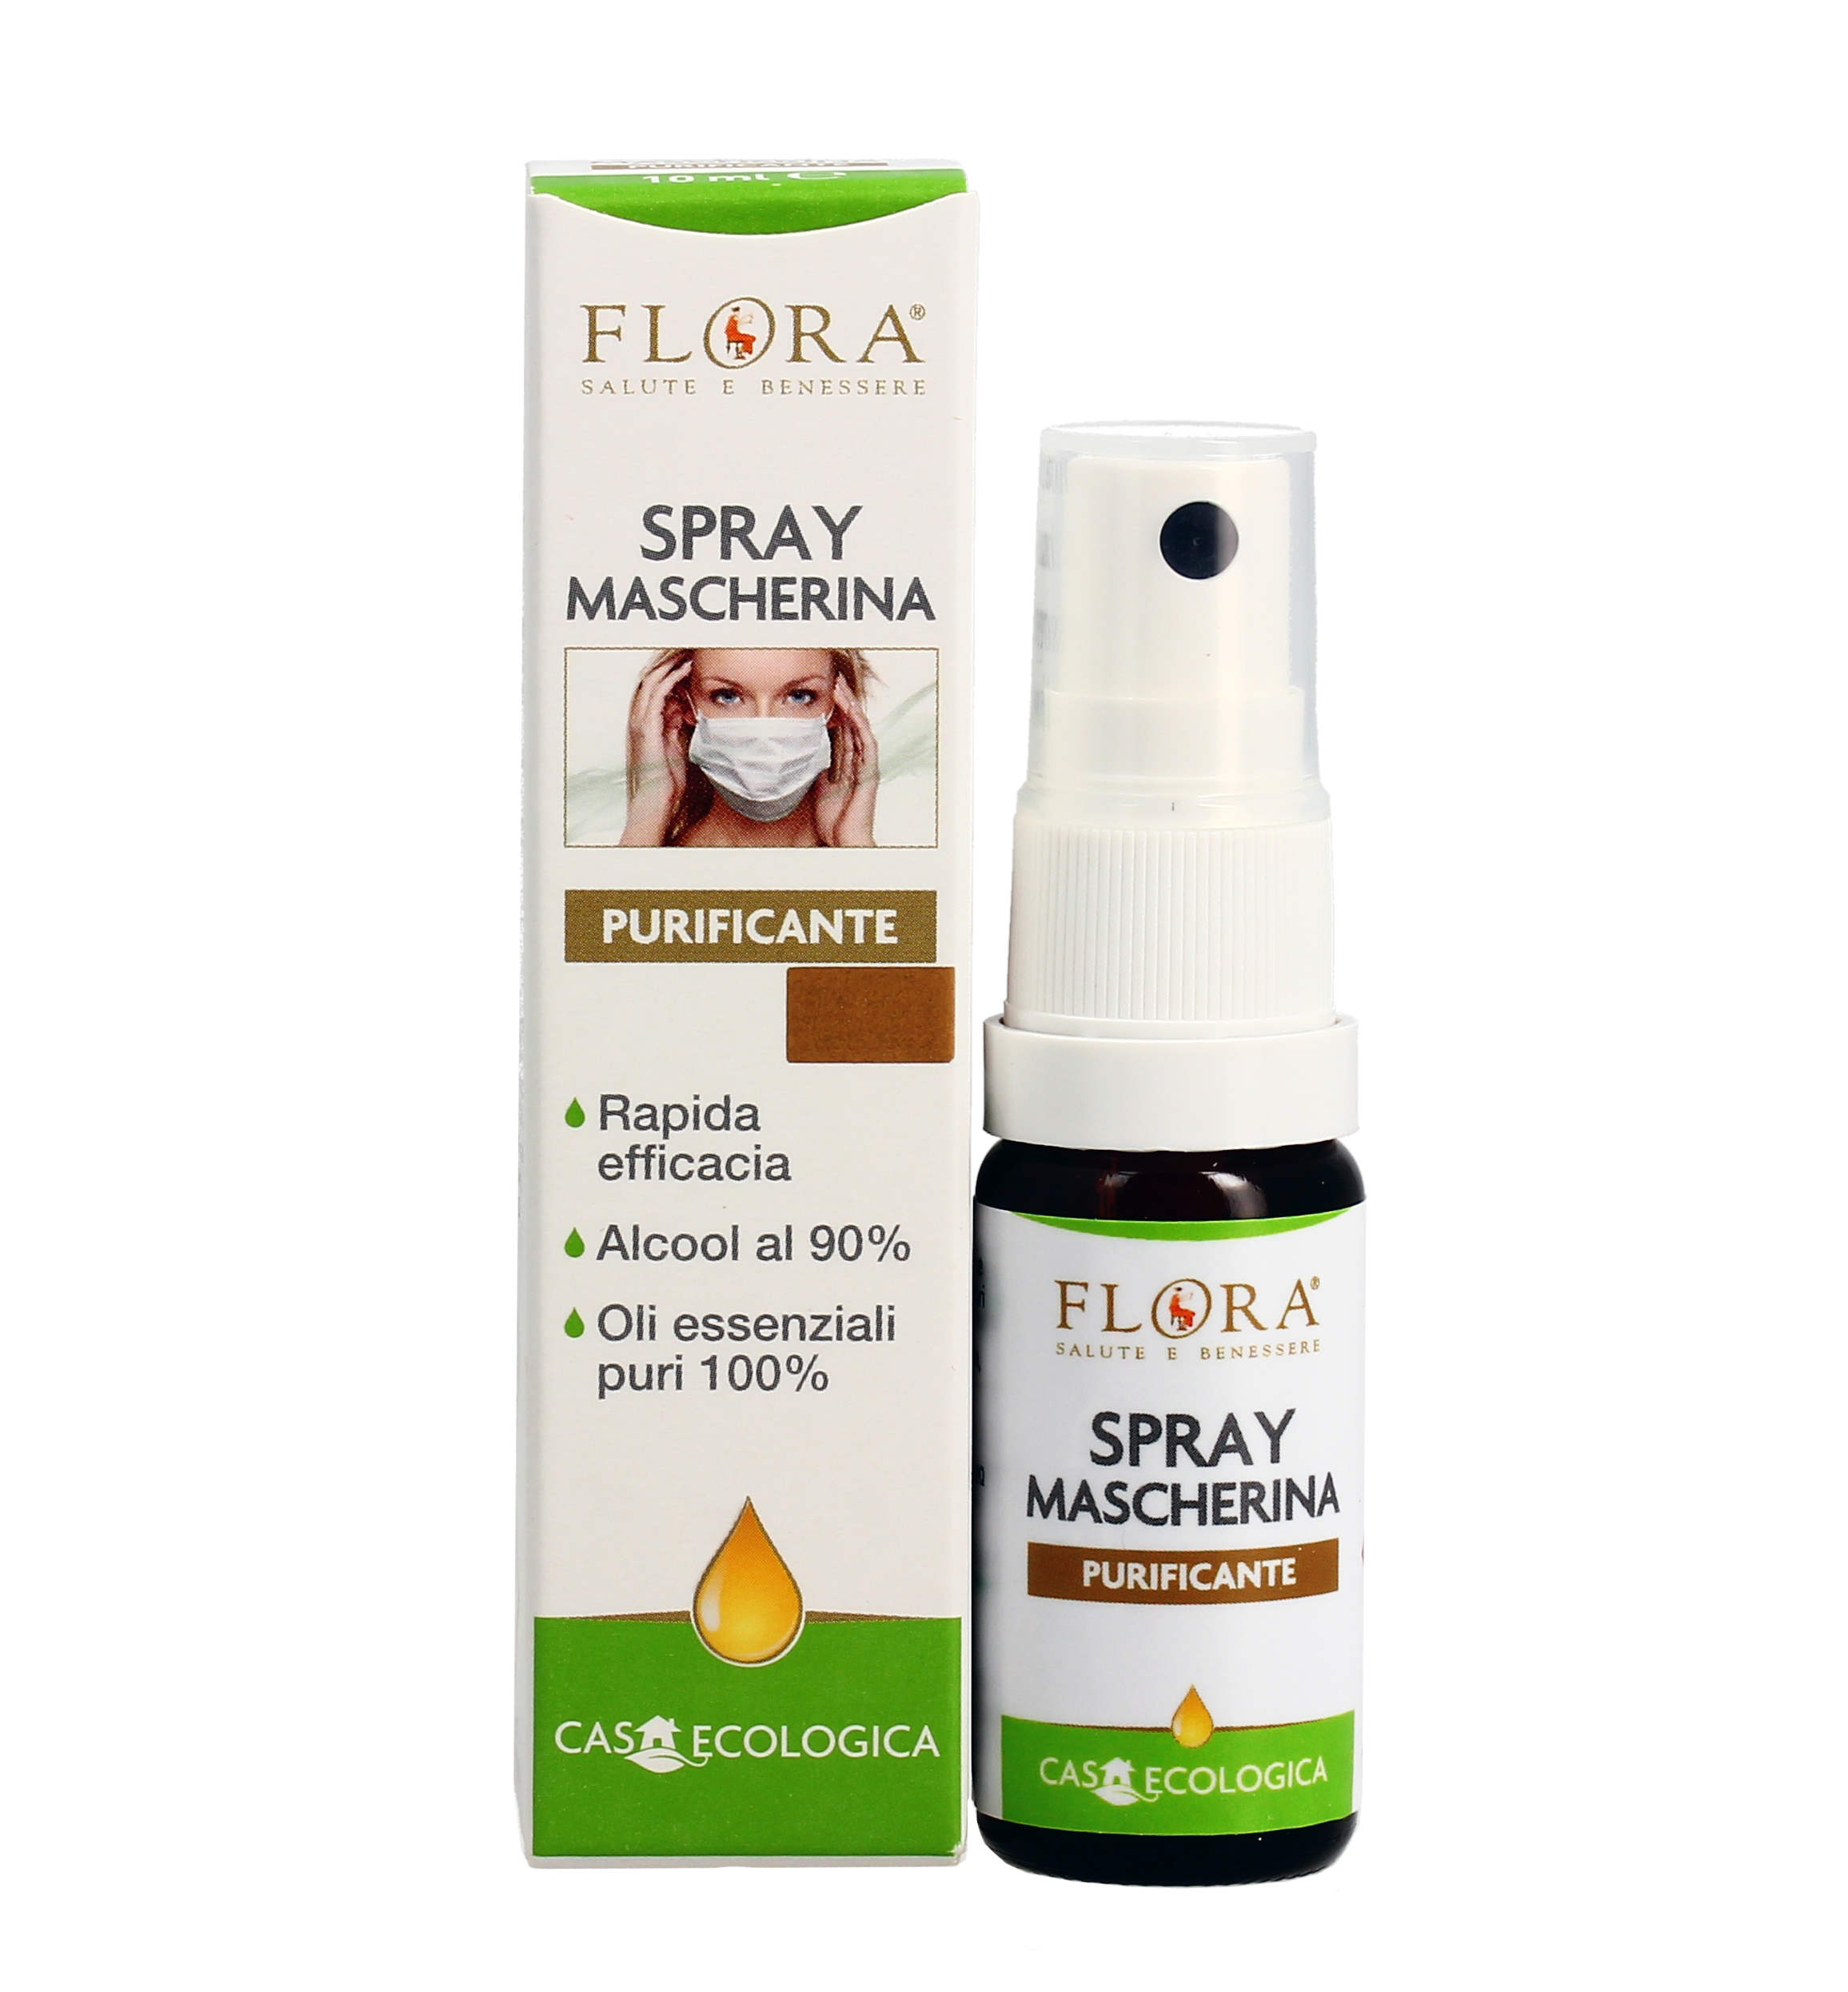 Spray Mascherina Purificante Con Oli Essenziali Flora